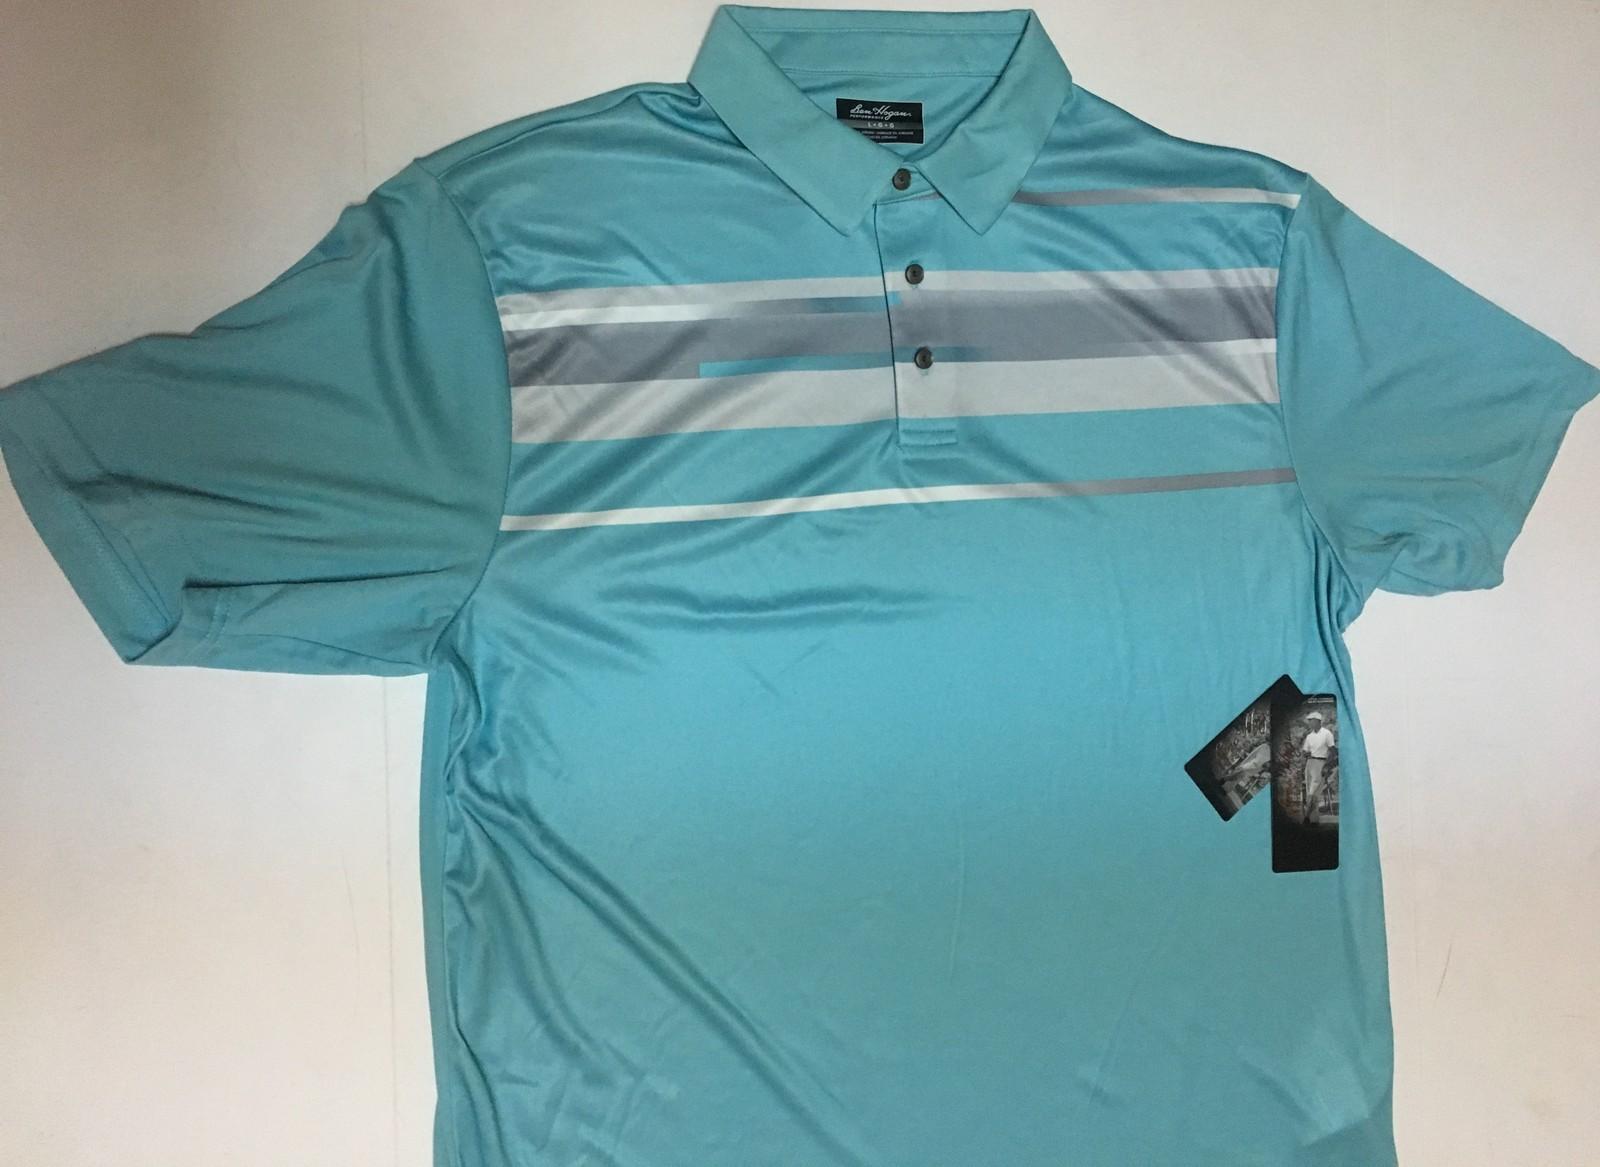 Ben Hogan Golf Performance Polo Shirt Aruba Blue Various Sizes